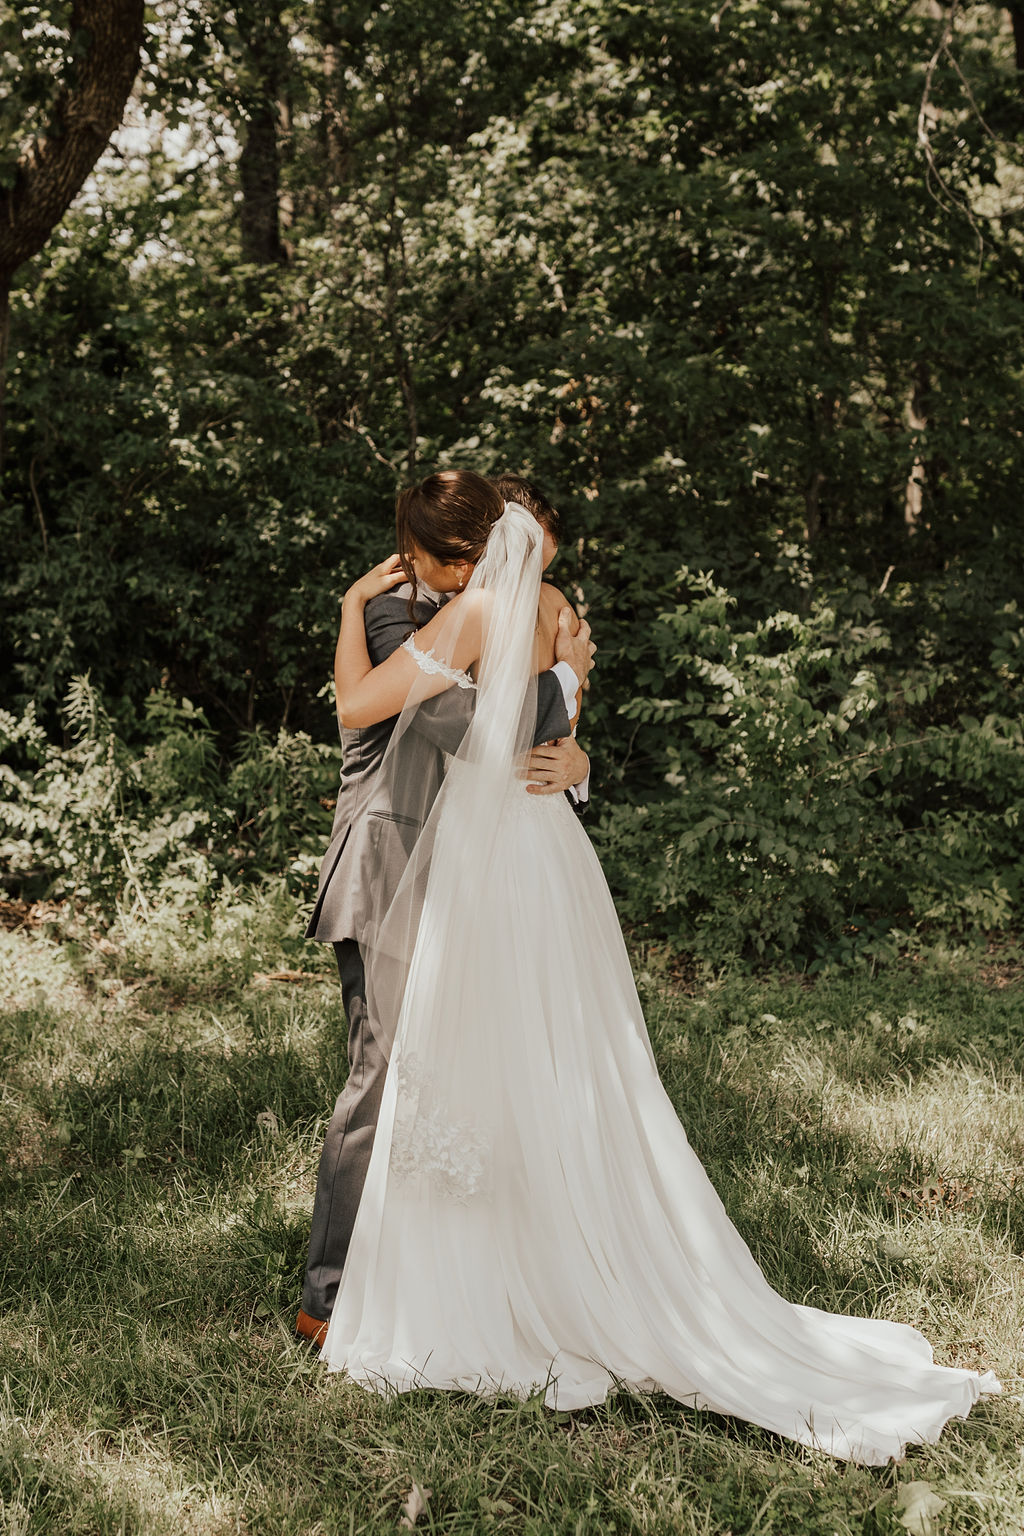 StLouis-Wedding-Photographer-Taylor+Michael-Portraits16.jpg